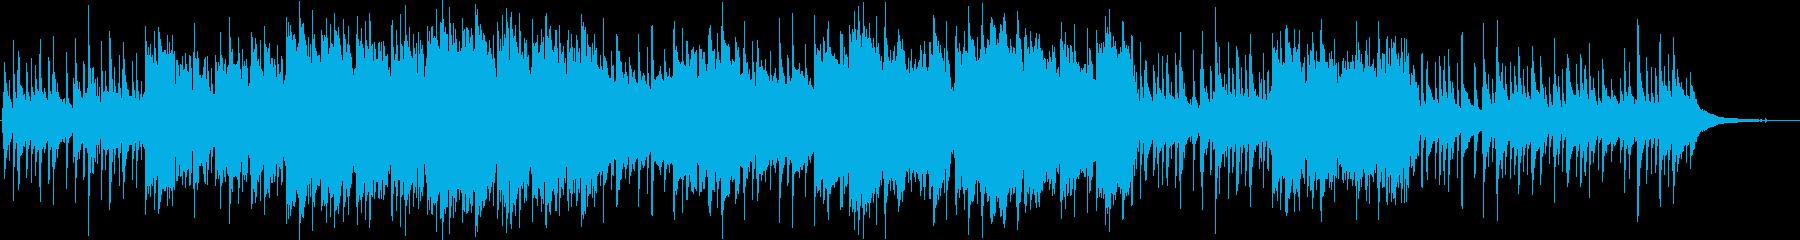 【PV】安らぎの空間、プライベートタイムの再生済みの波形